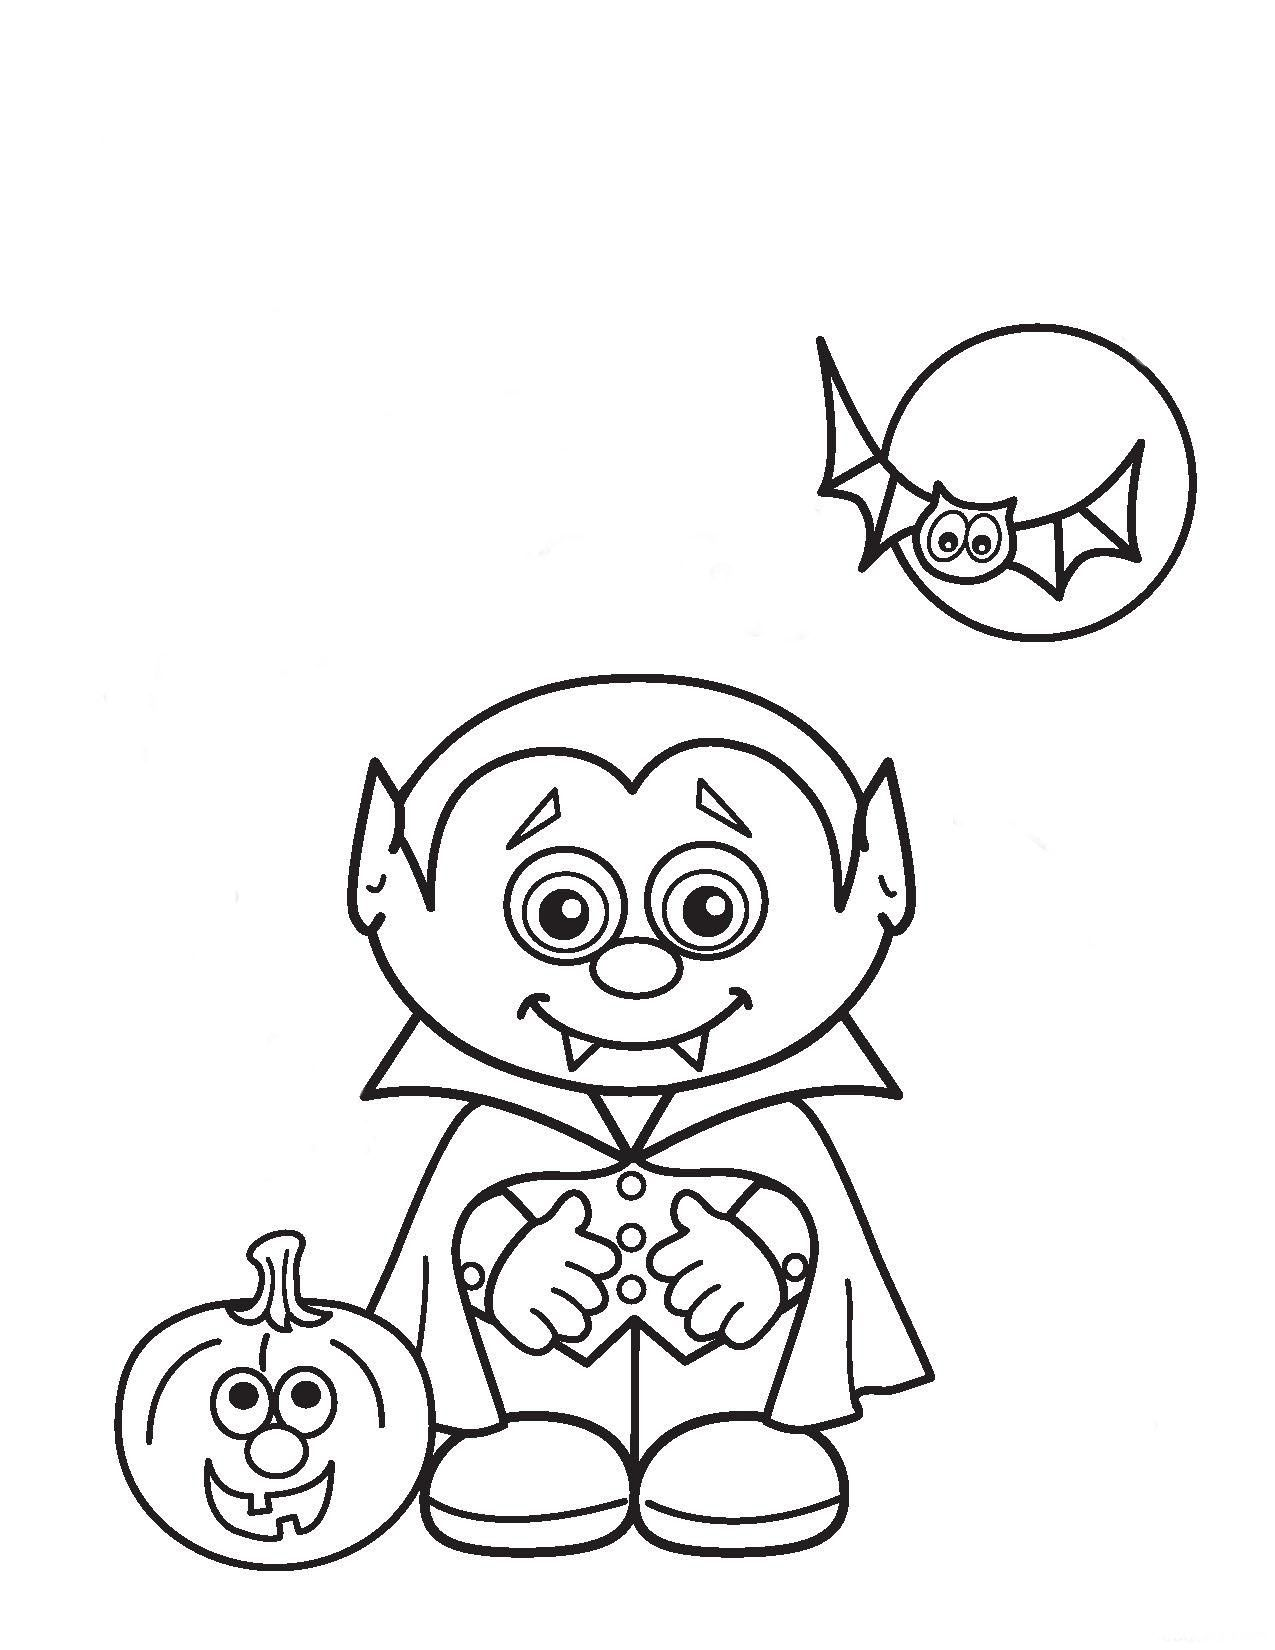 Resultado De Imagen Para Dibujos Para Colorear De Vampiros Animados Halloween Para Colorear Dibujos De Halloween Halloween Preescolar